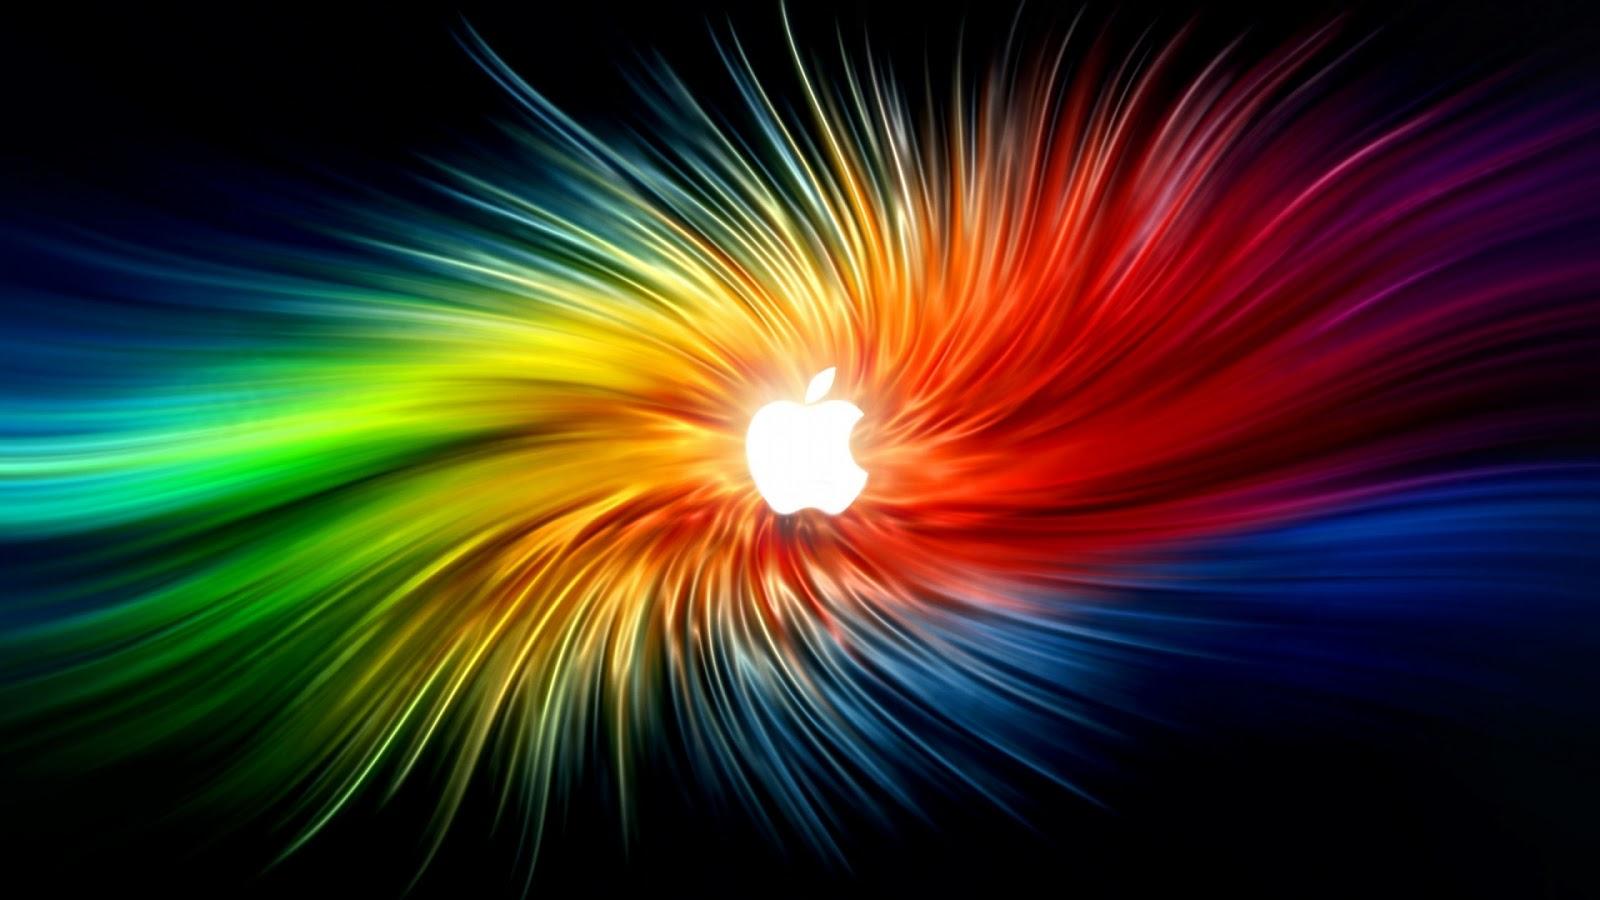 HD WAllppaers: Apple Wallpaper HD 1080p